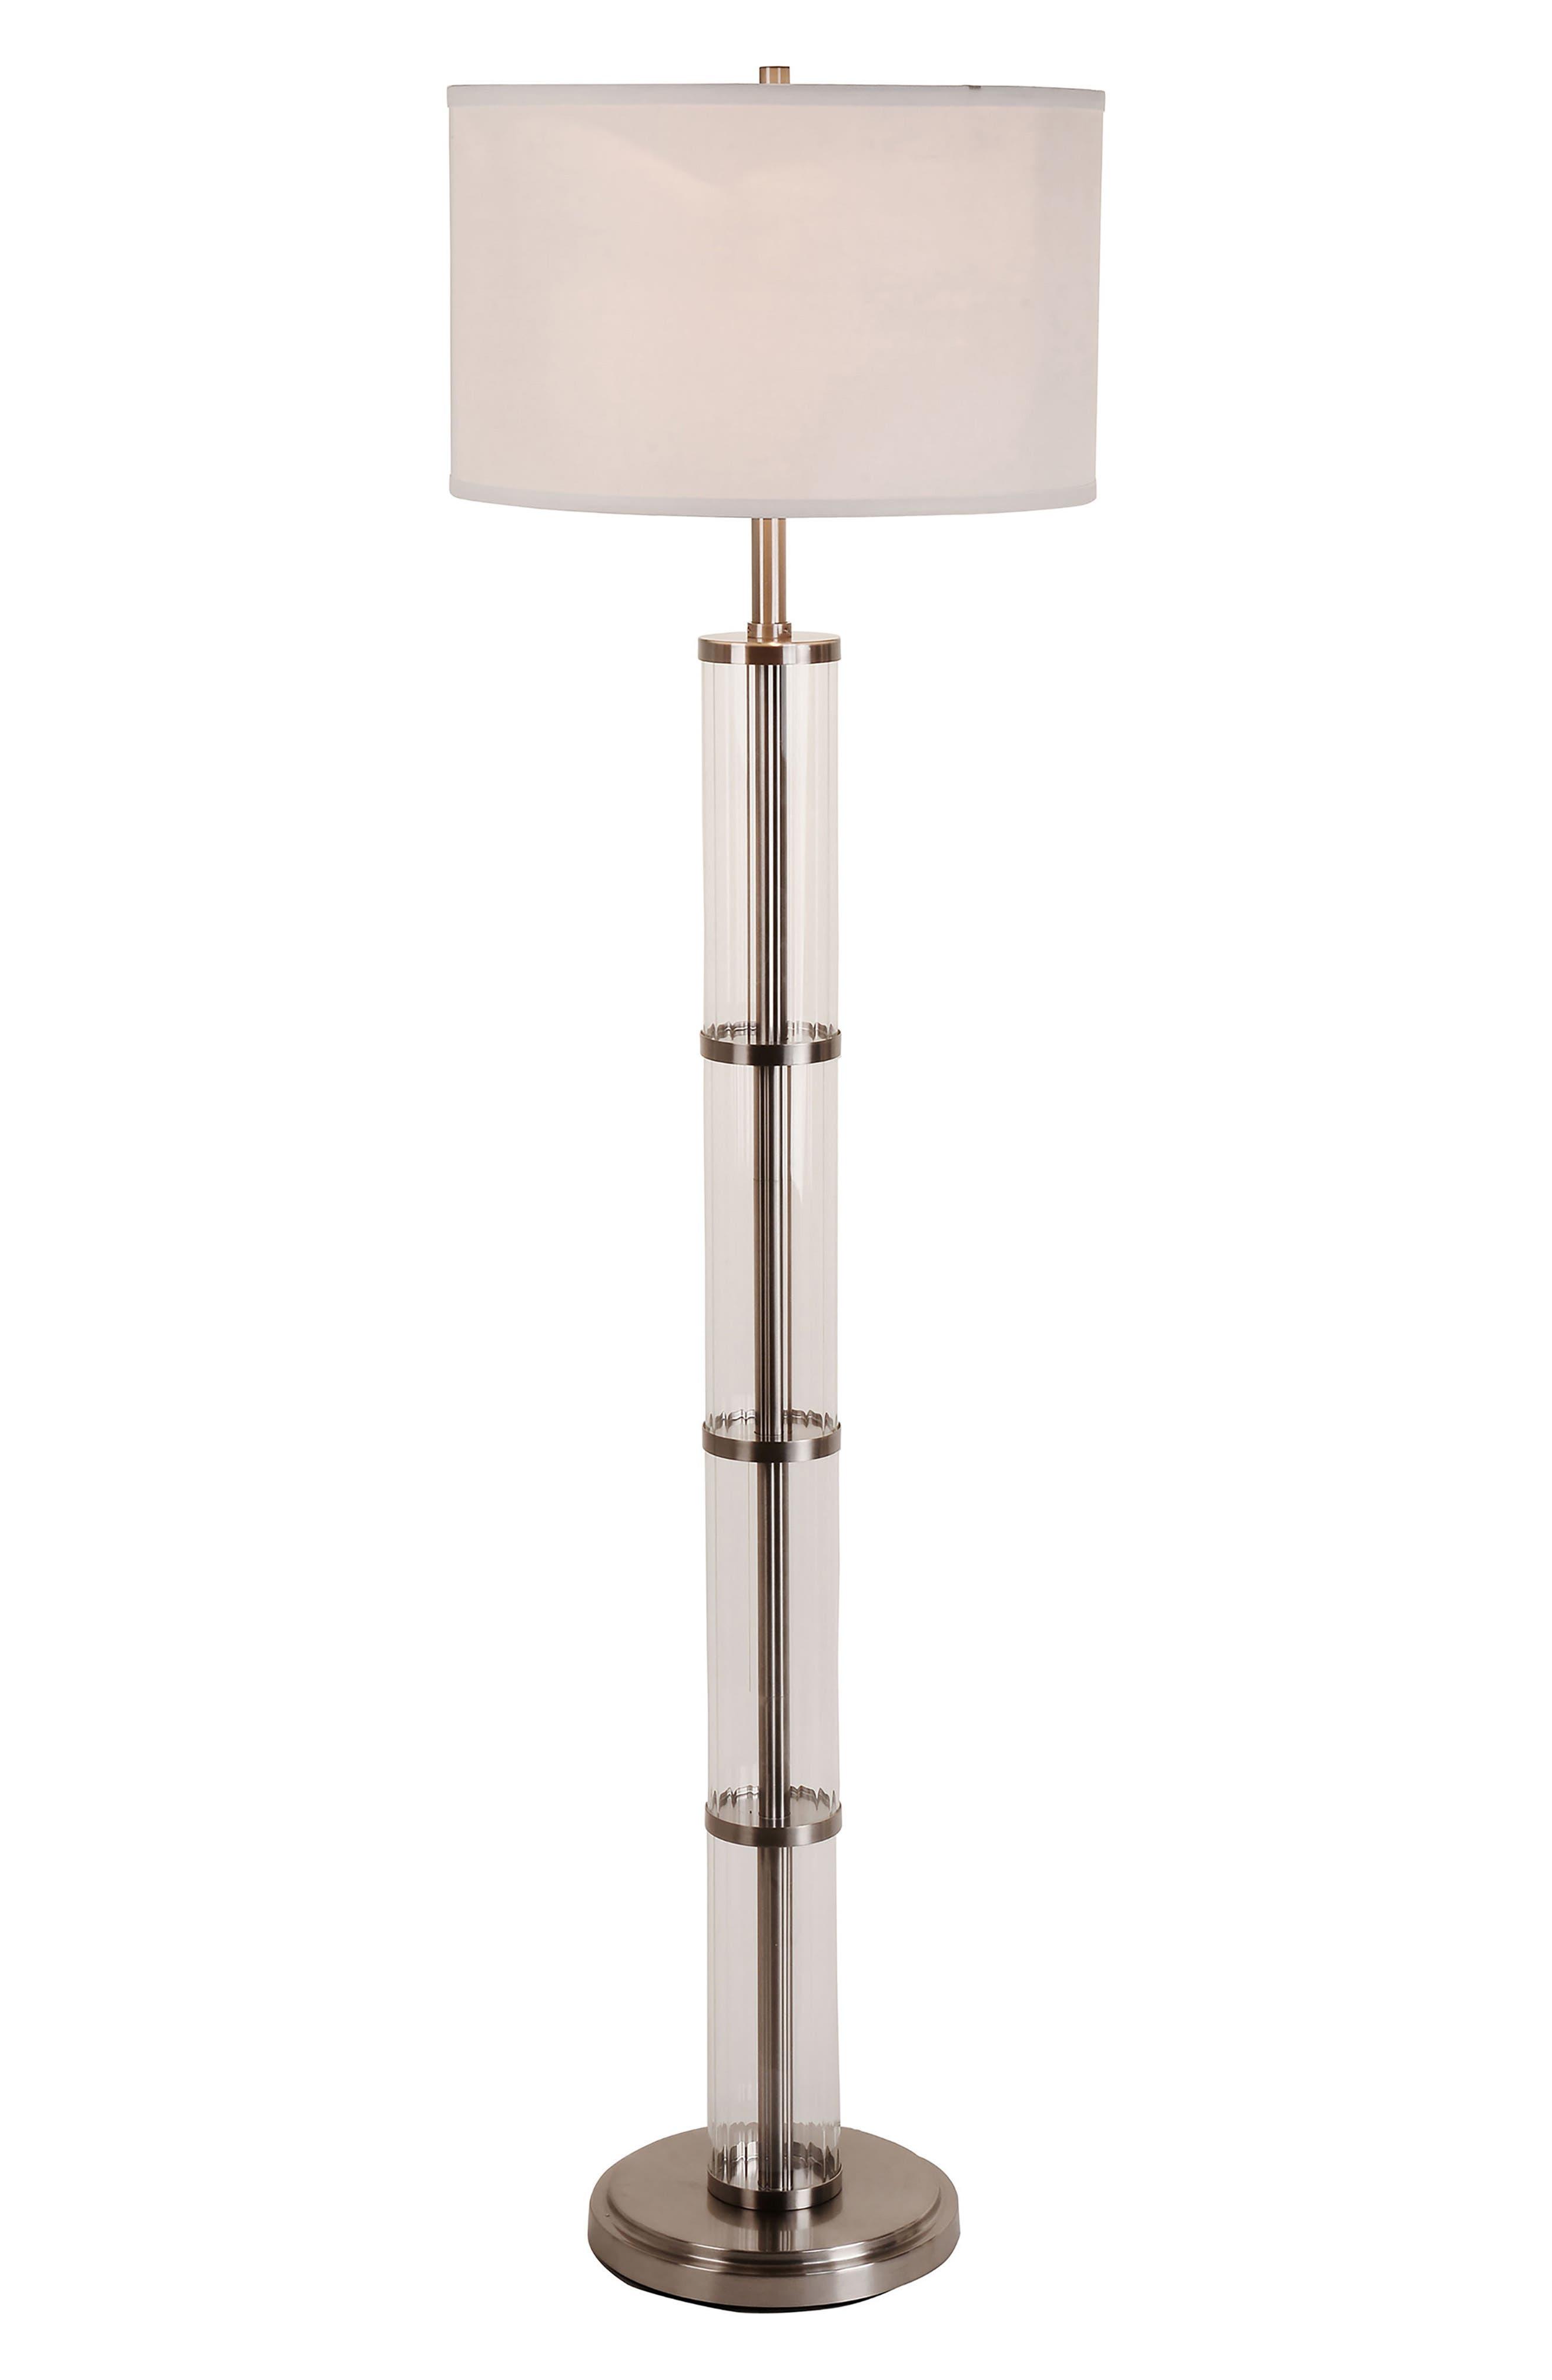 JAlexander Ribbed Glass Floor Lamp